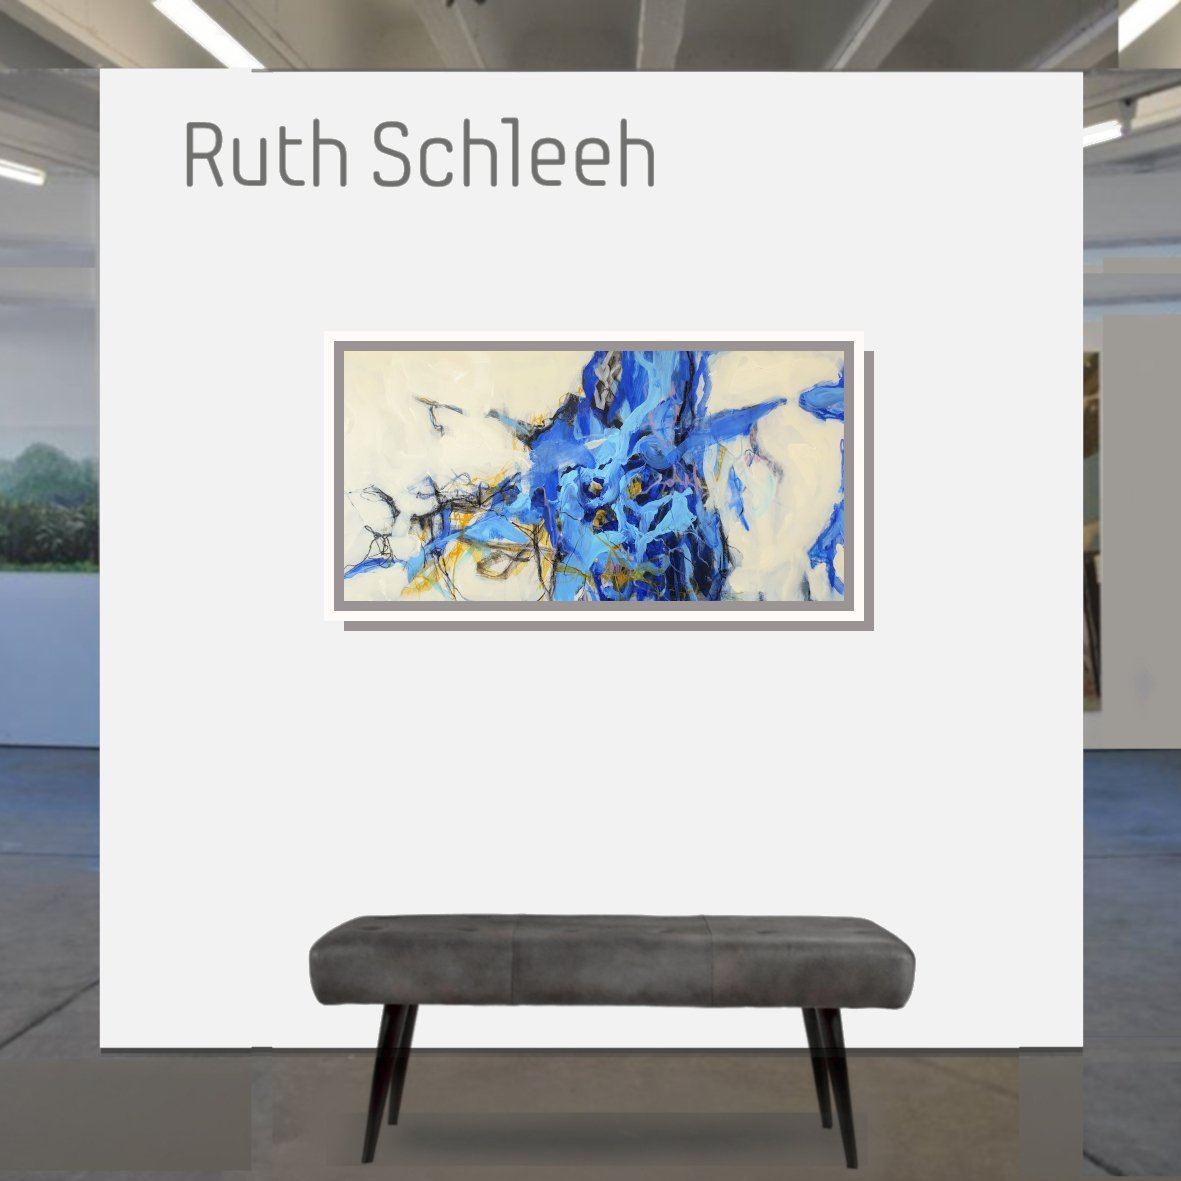 Schleeh_maske_WV 646 Gr. 50 x 100 Wolkenaeste